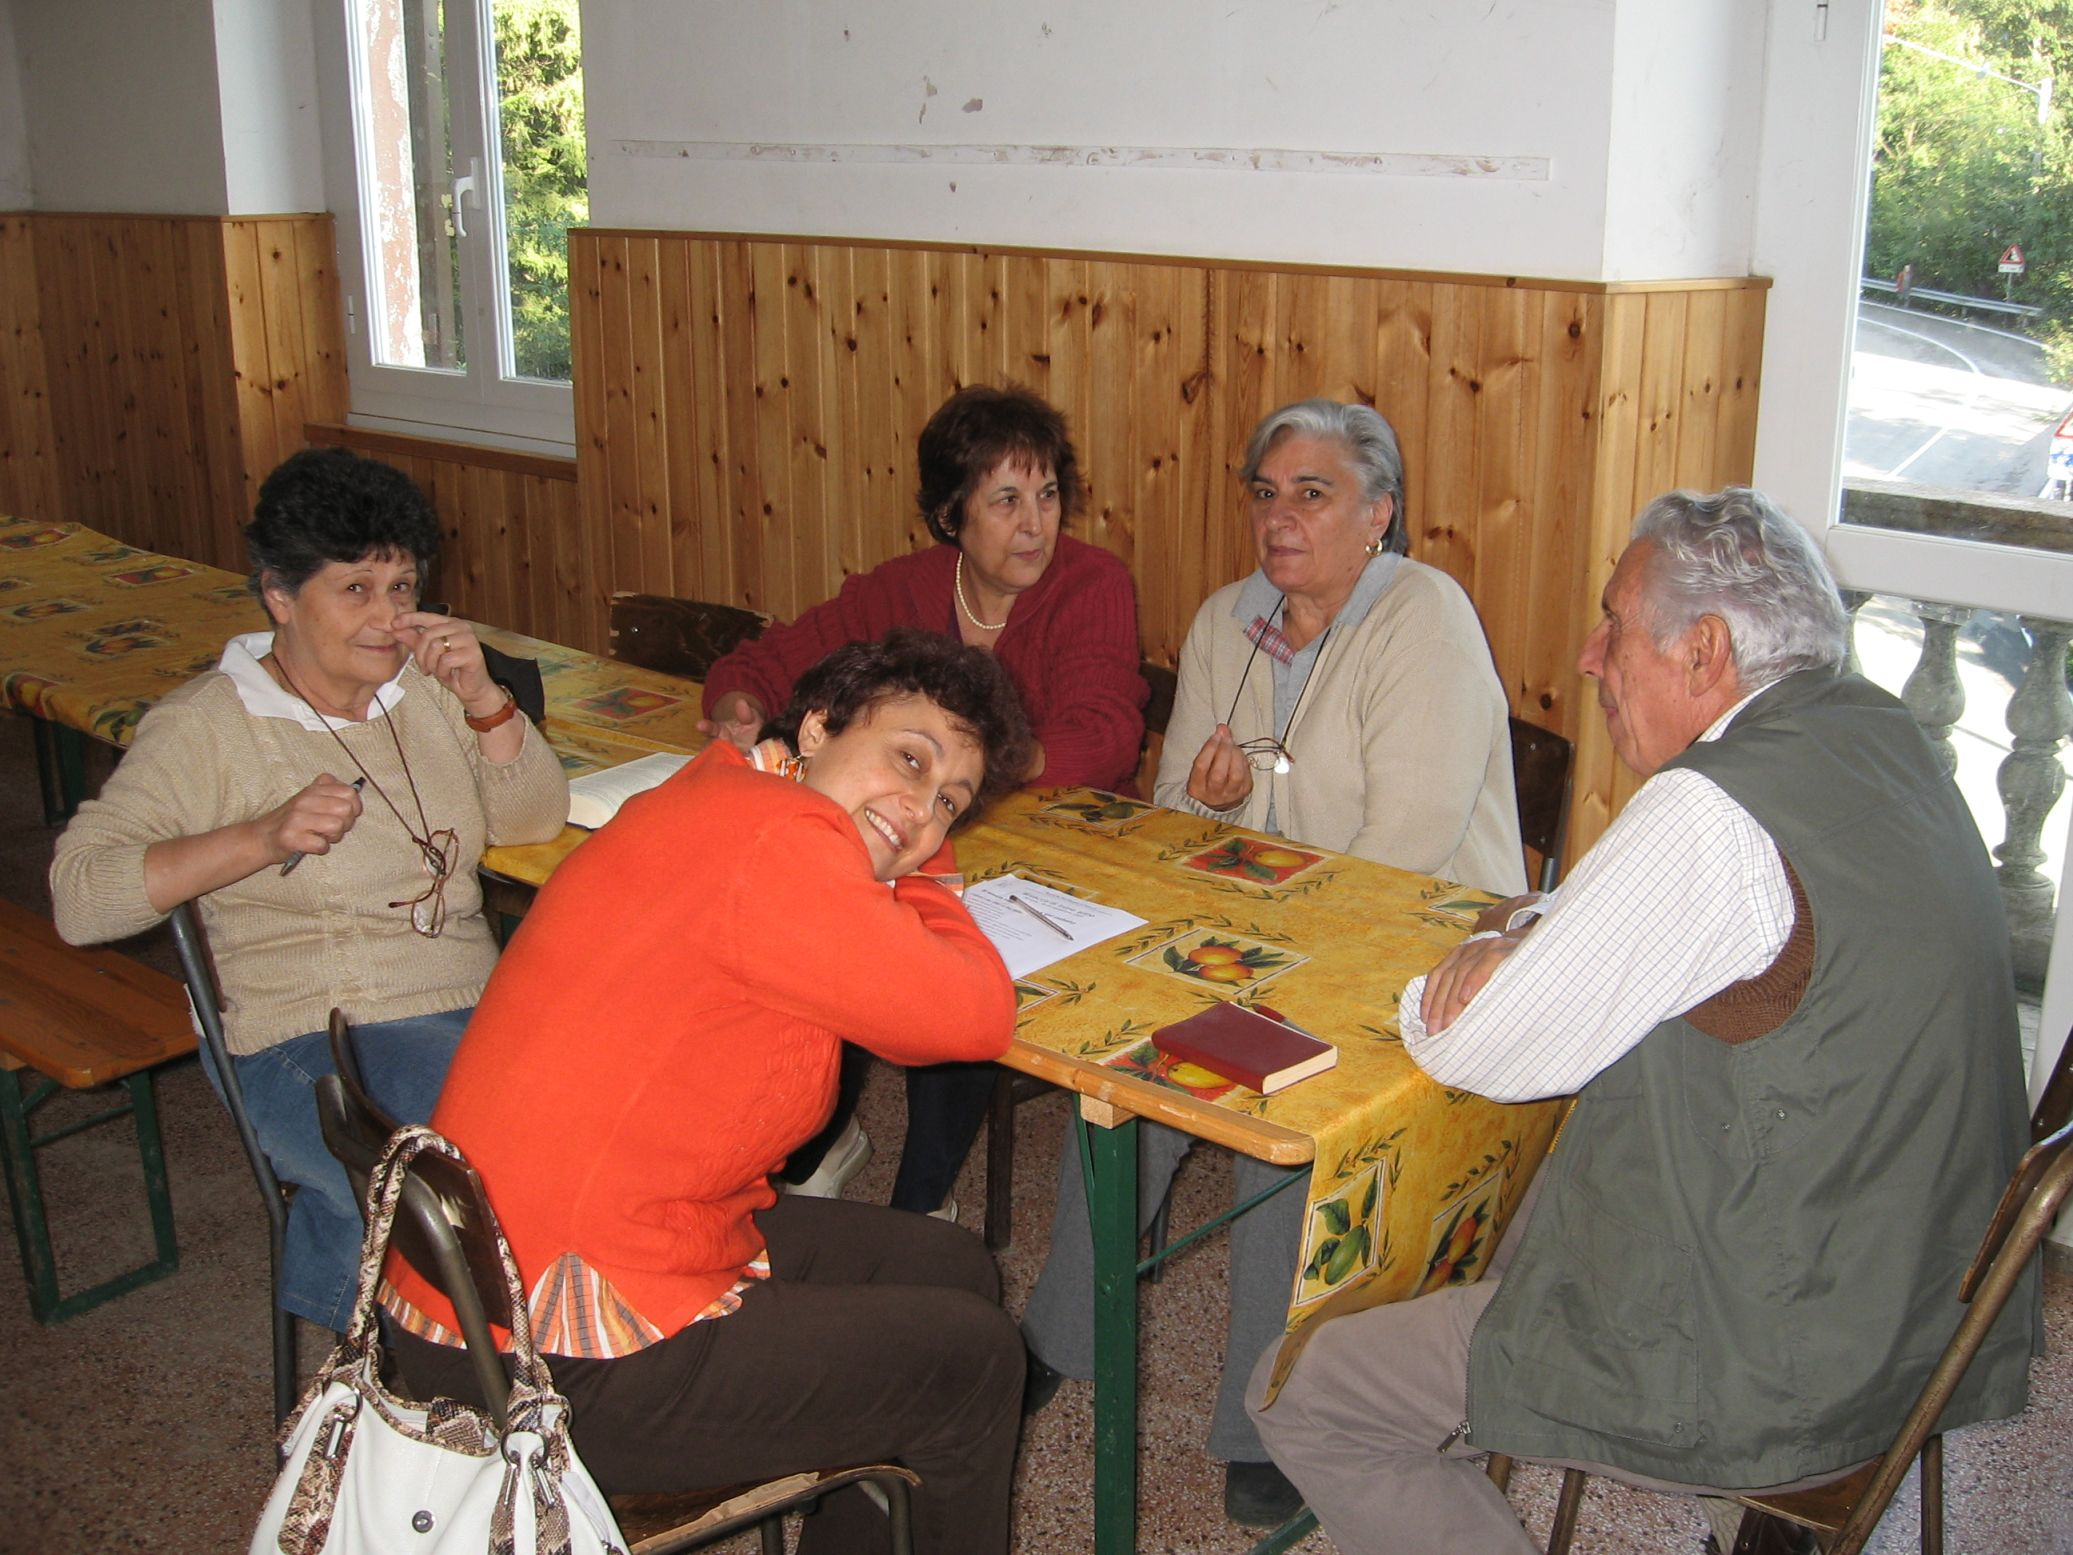 Bivacco_Persone_Impegnate_Torriglia-2009-09-19--17.52.46